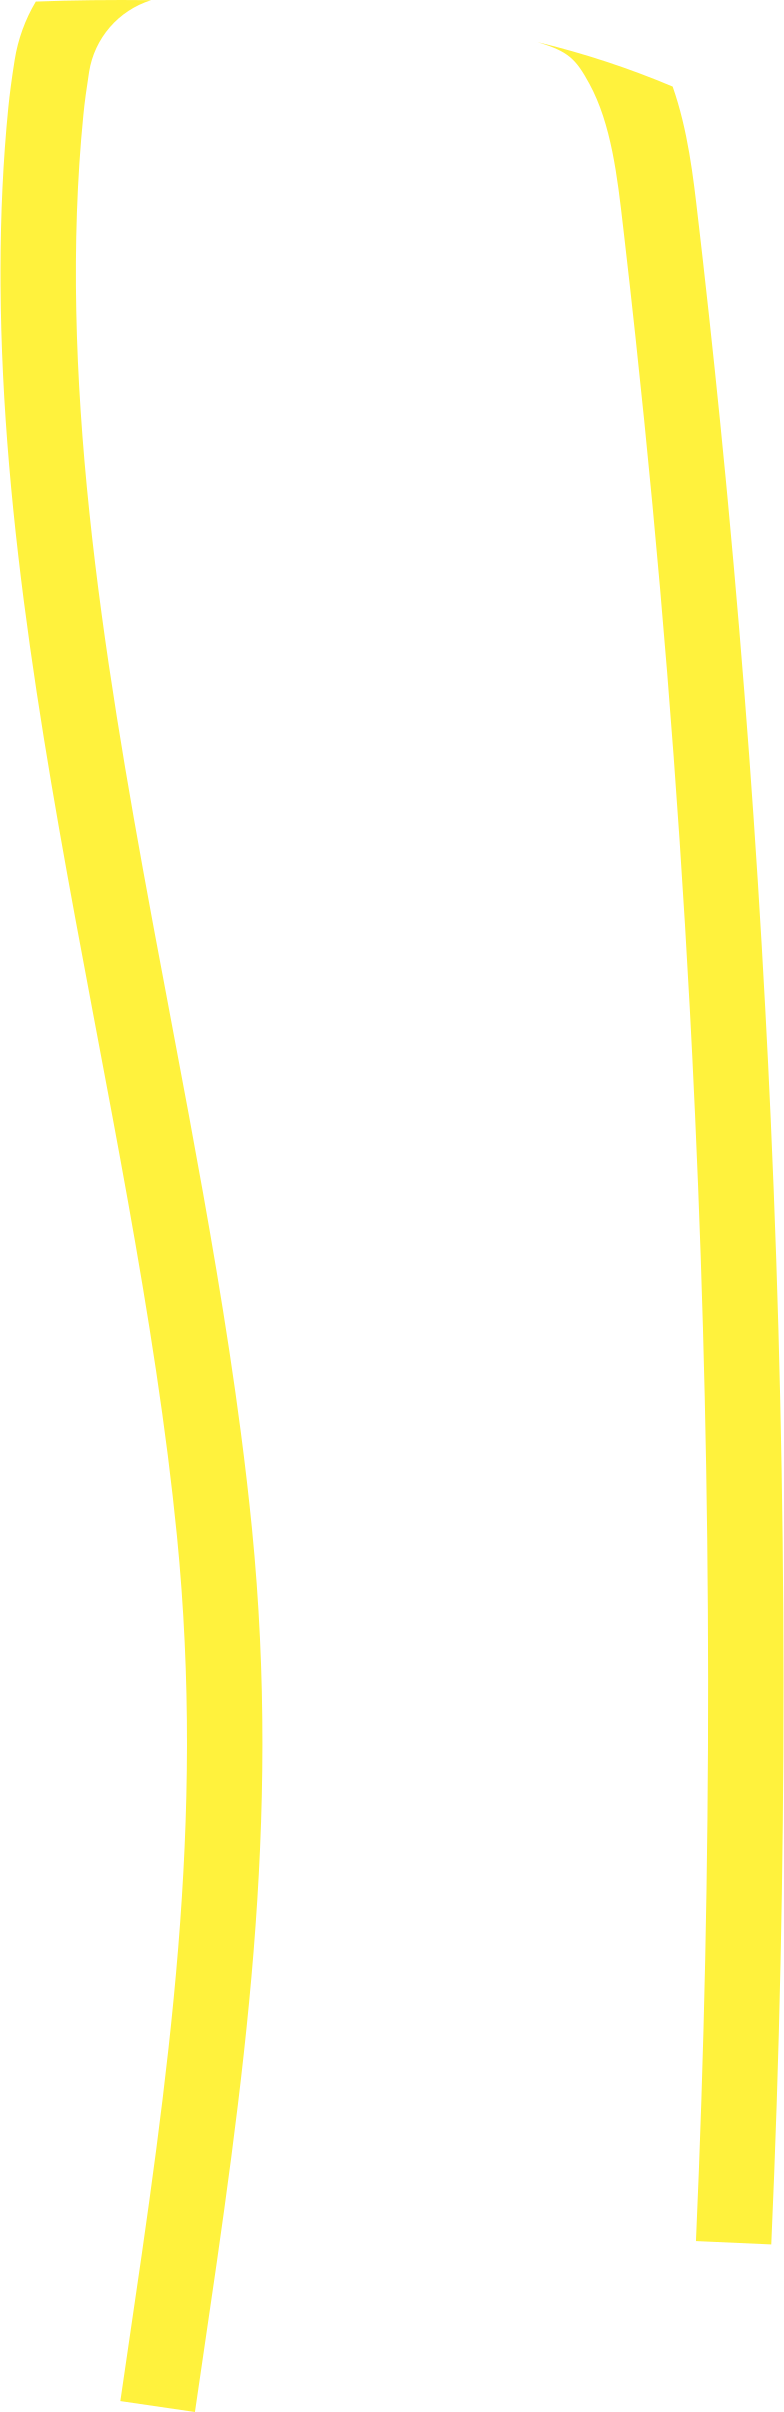 measuring tape Clipart illustration in PNG, SVG